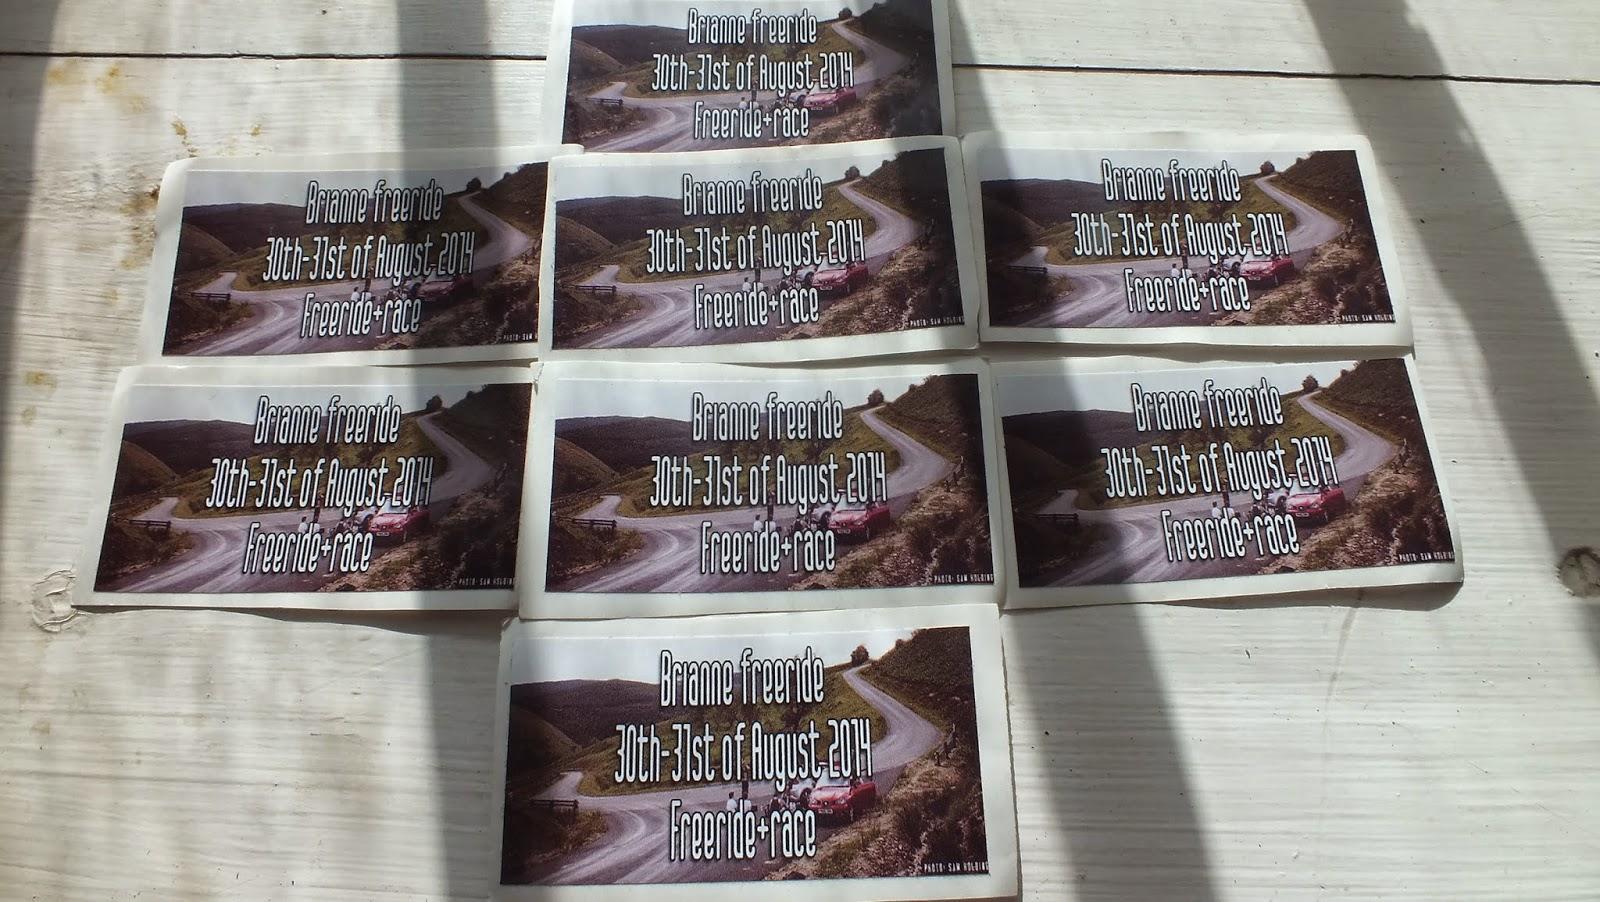 Brianne Freeride 2014 Discount Sticker Printing